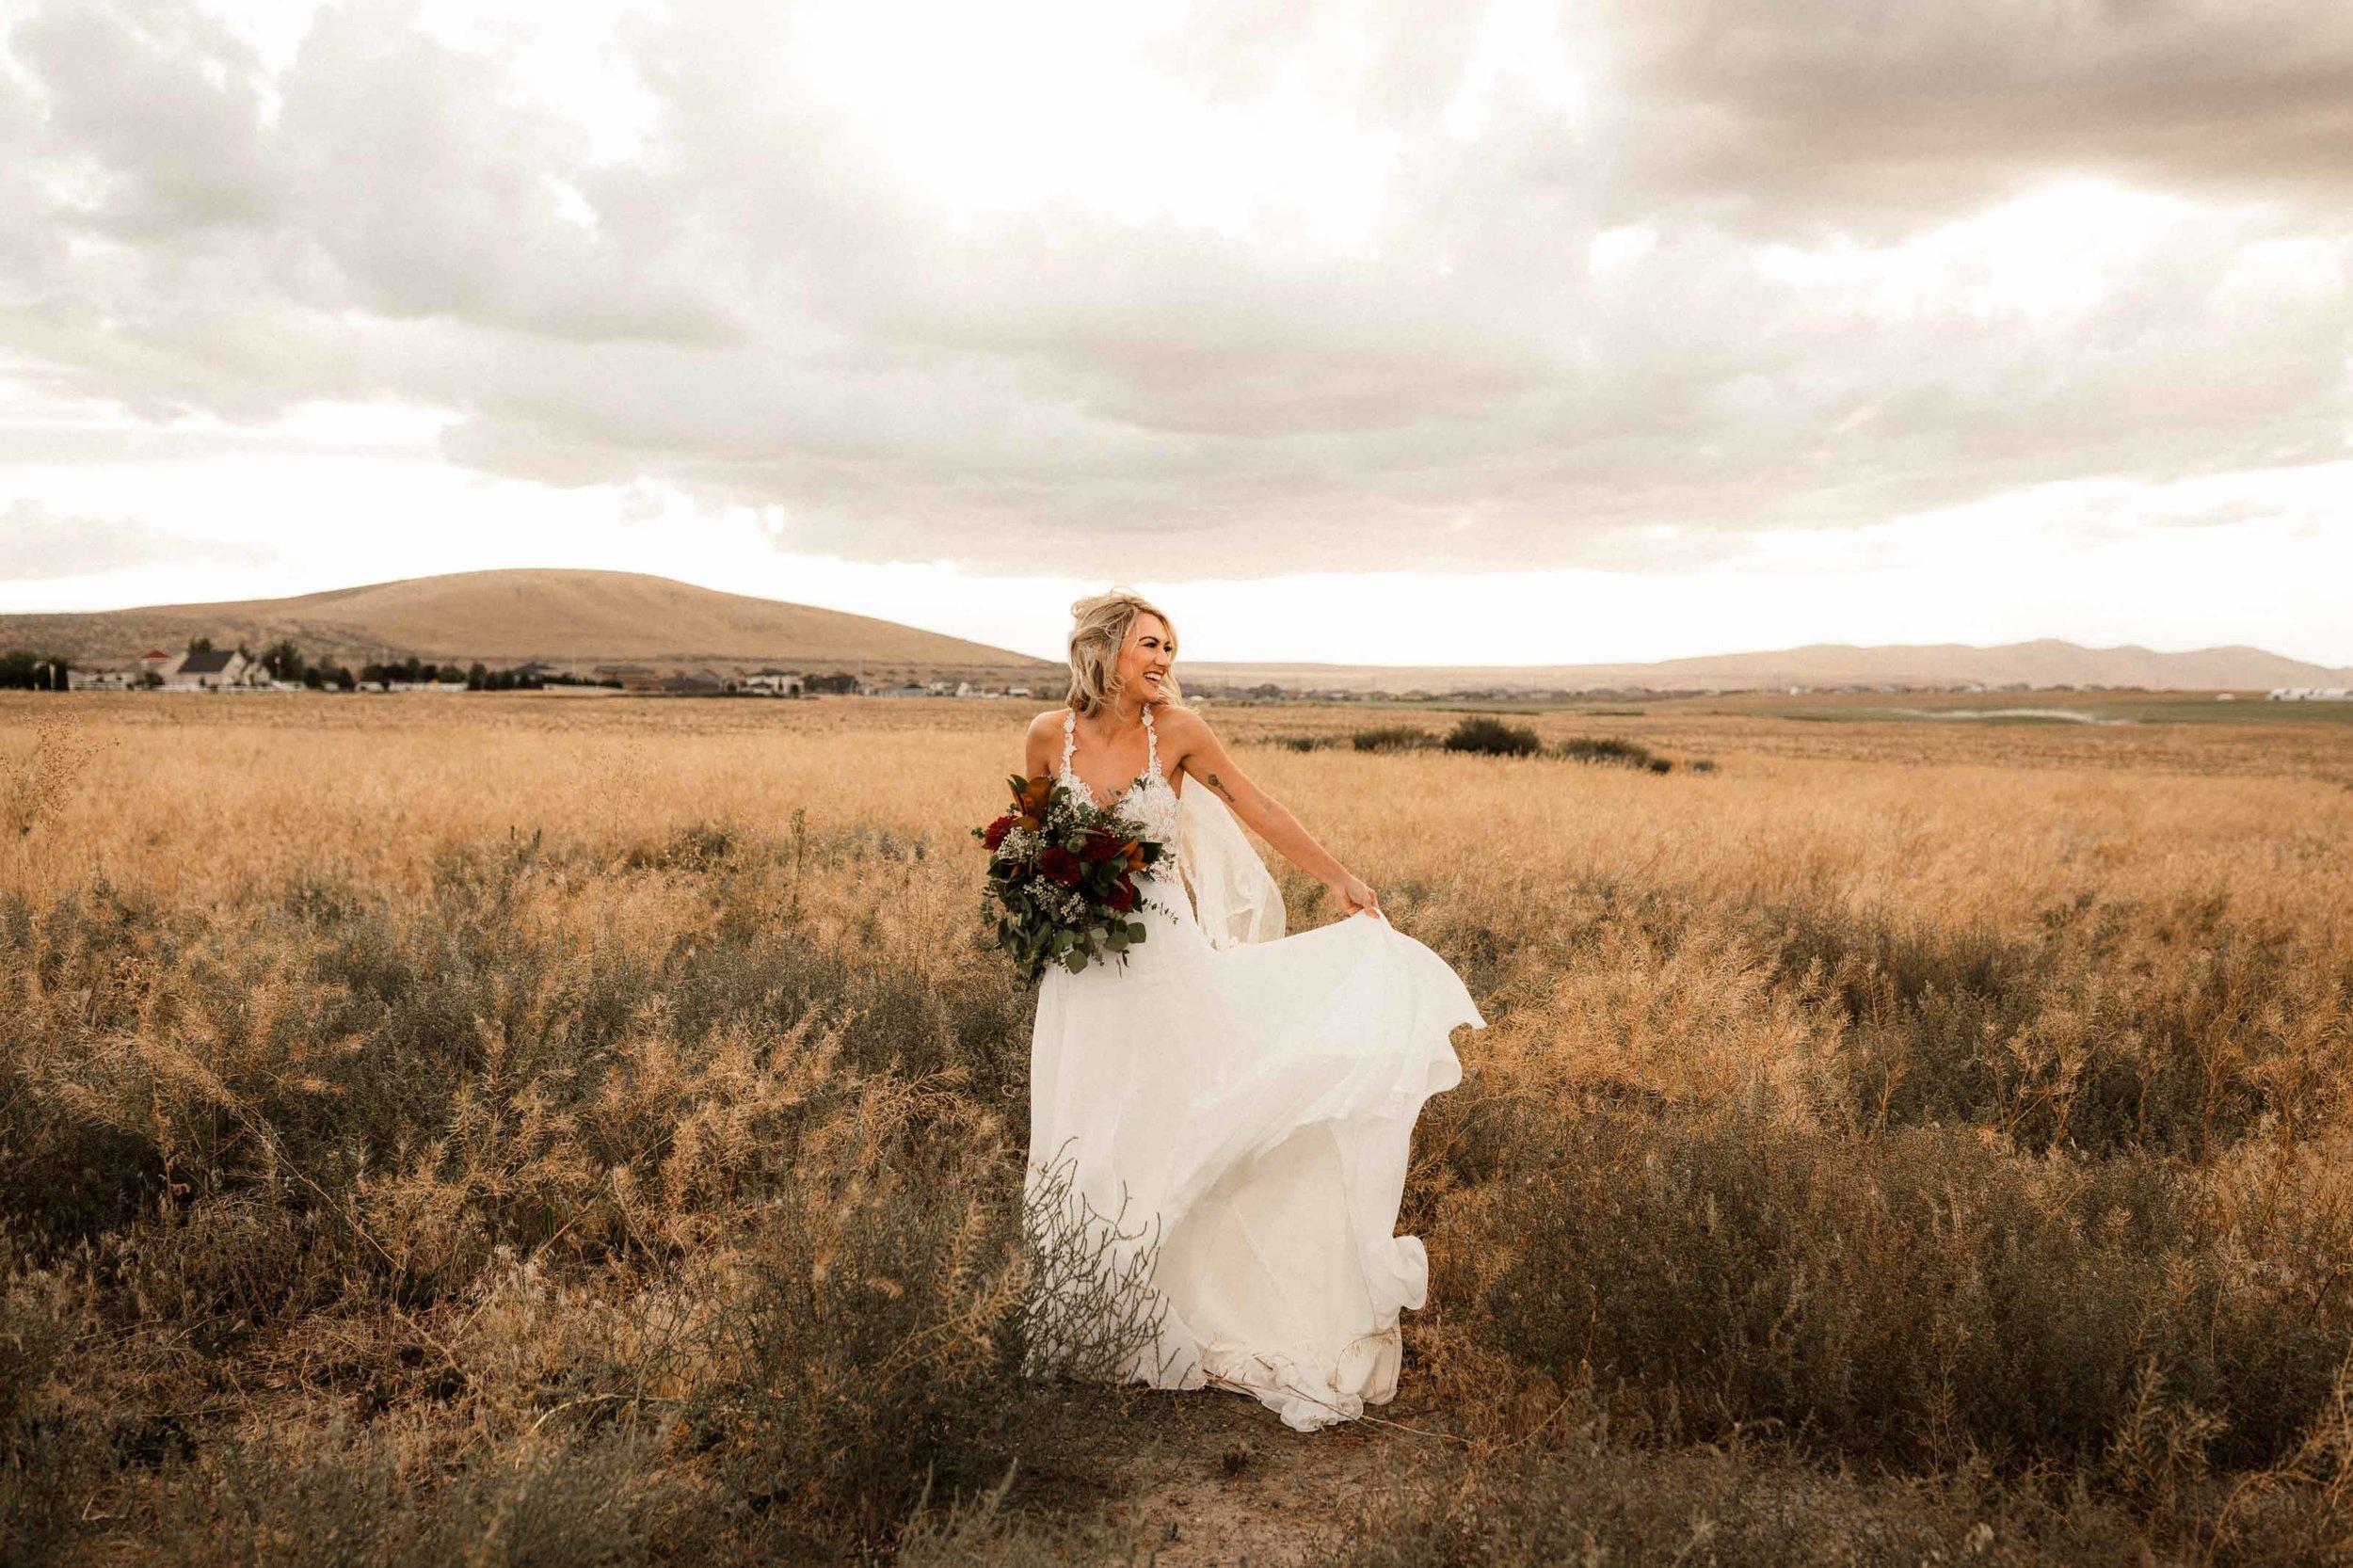 kennewick-bridal-shoot-7.jpg